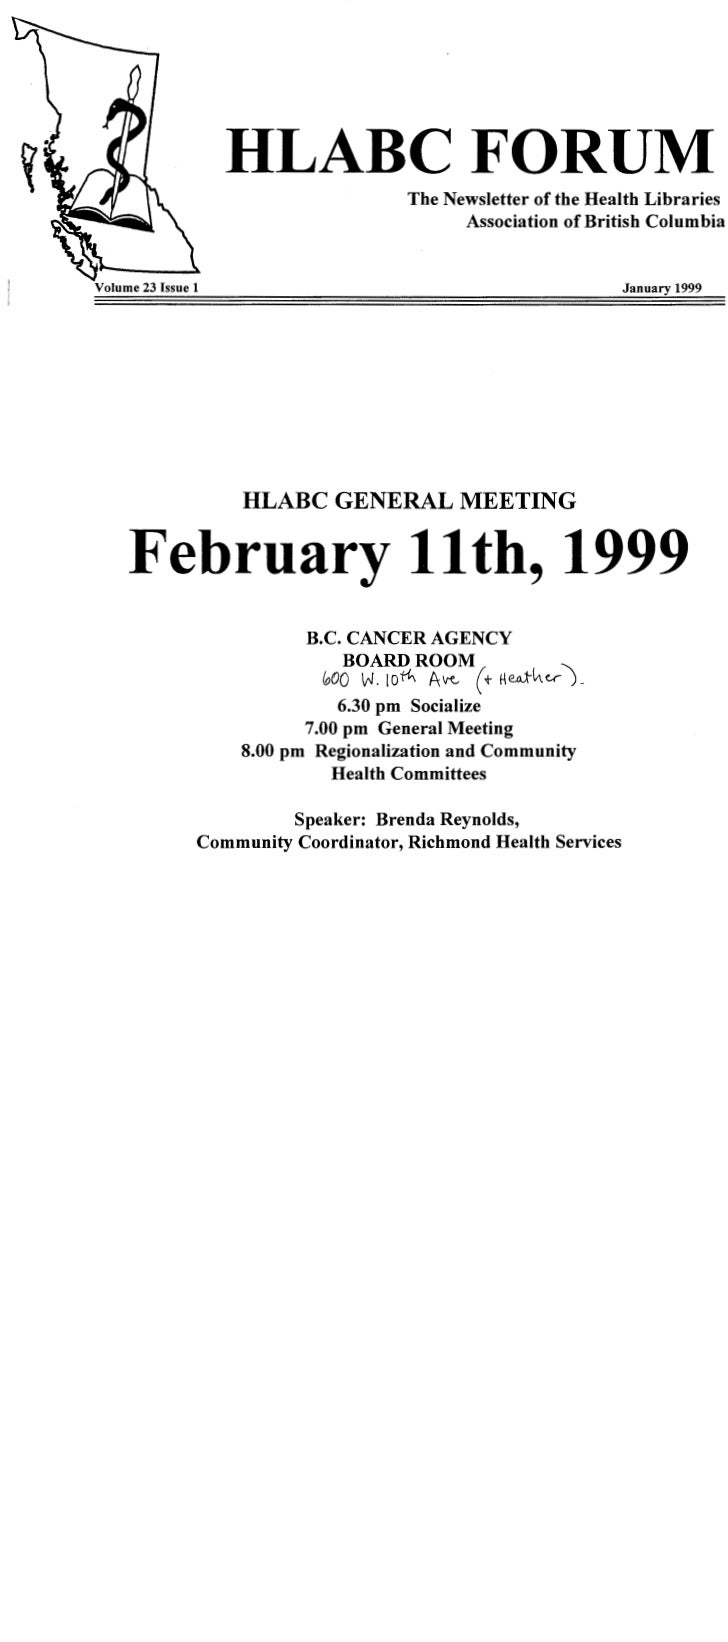 HLABC Forum: January 1999